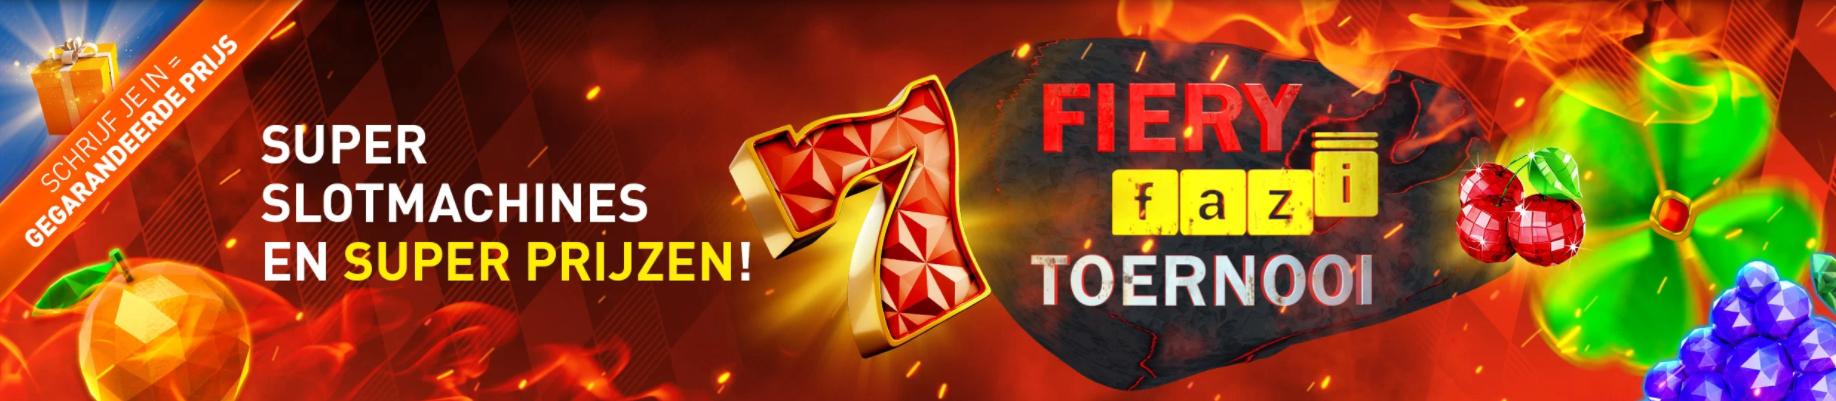 Fiery Fazi Toernooi Casino 777 online Speelhal G